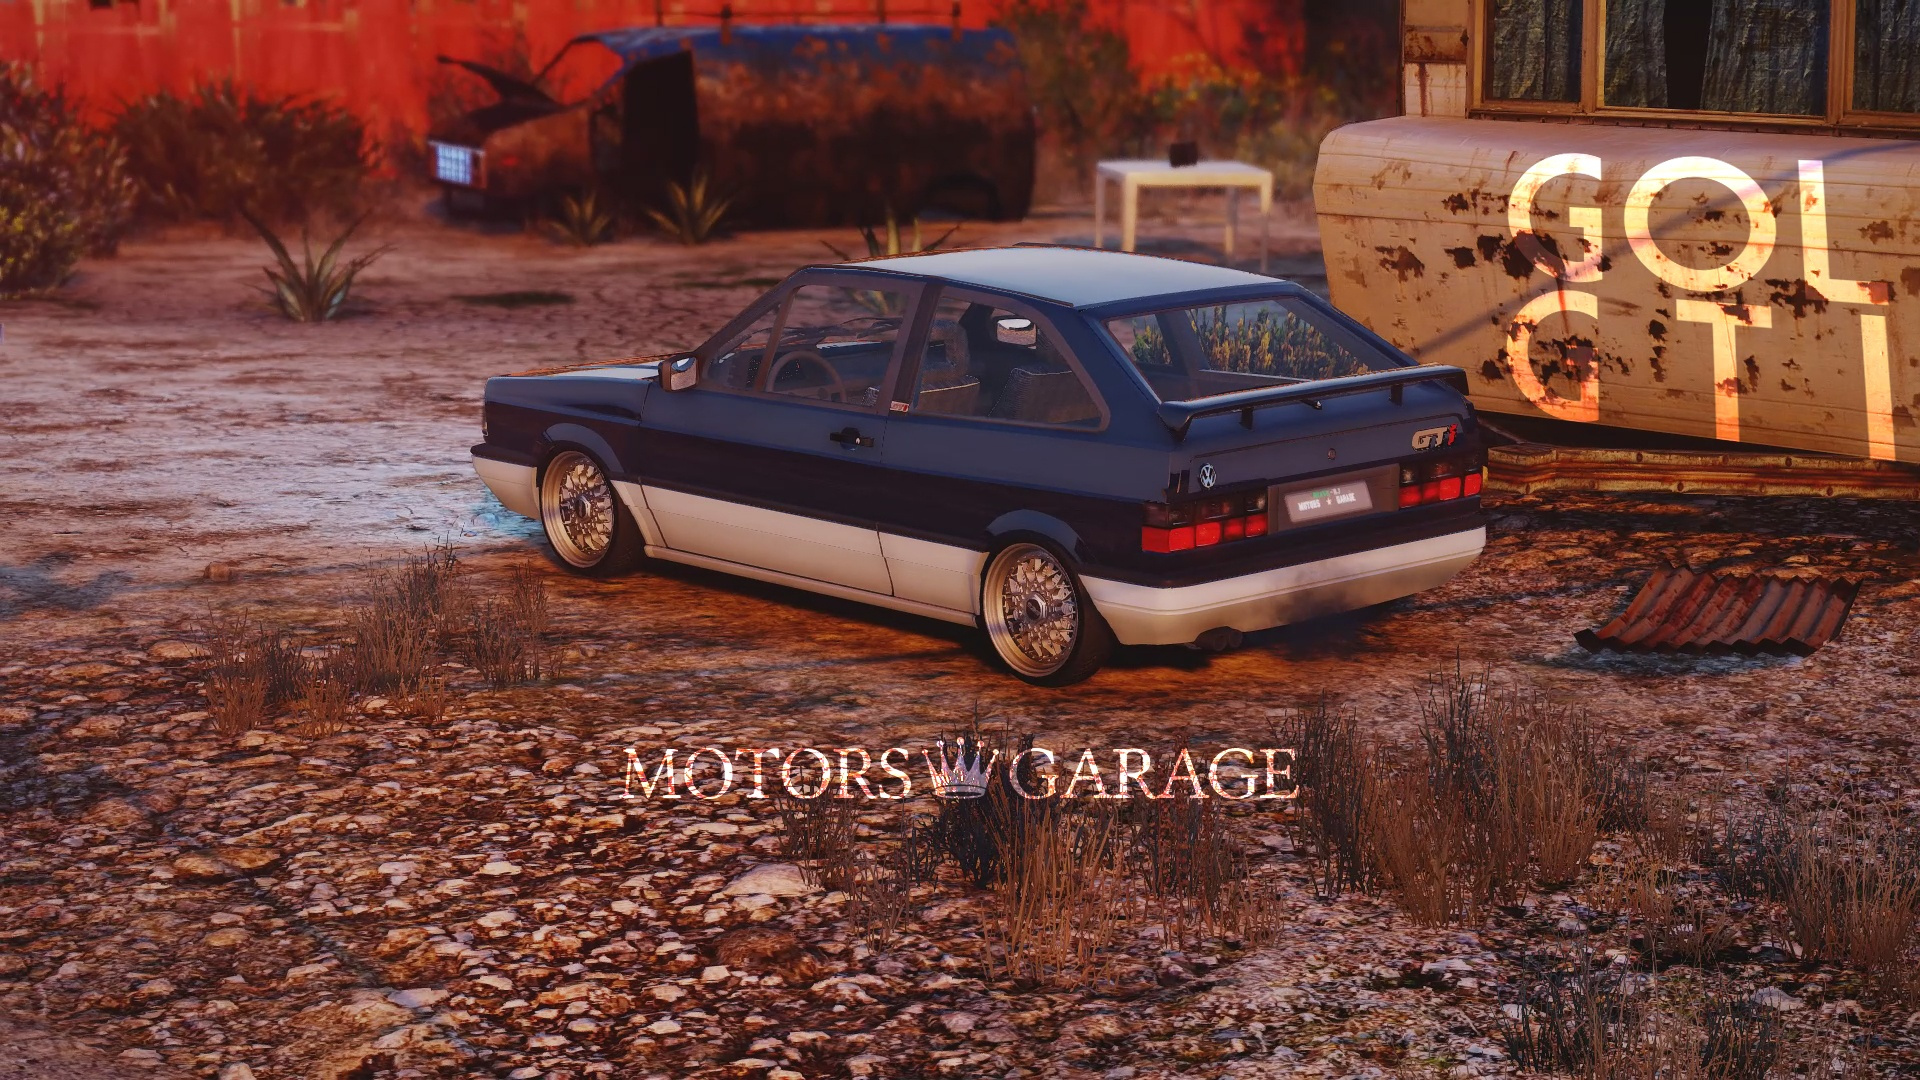 Volkswagen gol gti 89 add on gta5 for Garage mitsubishi 95